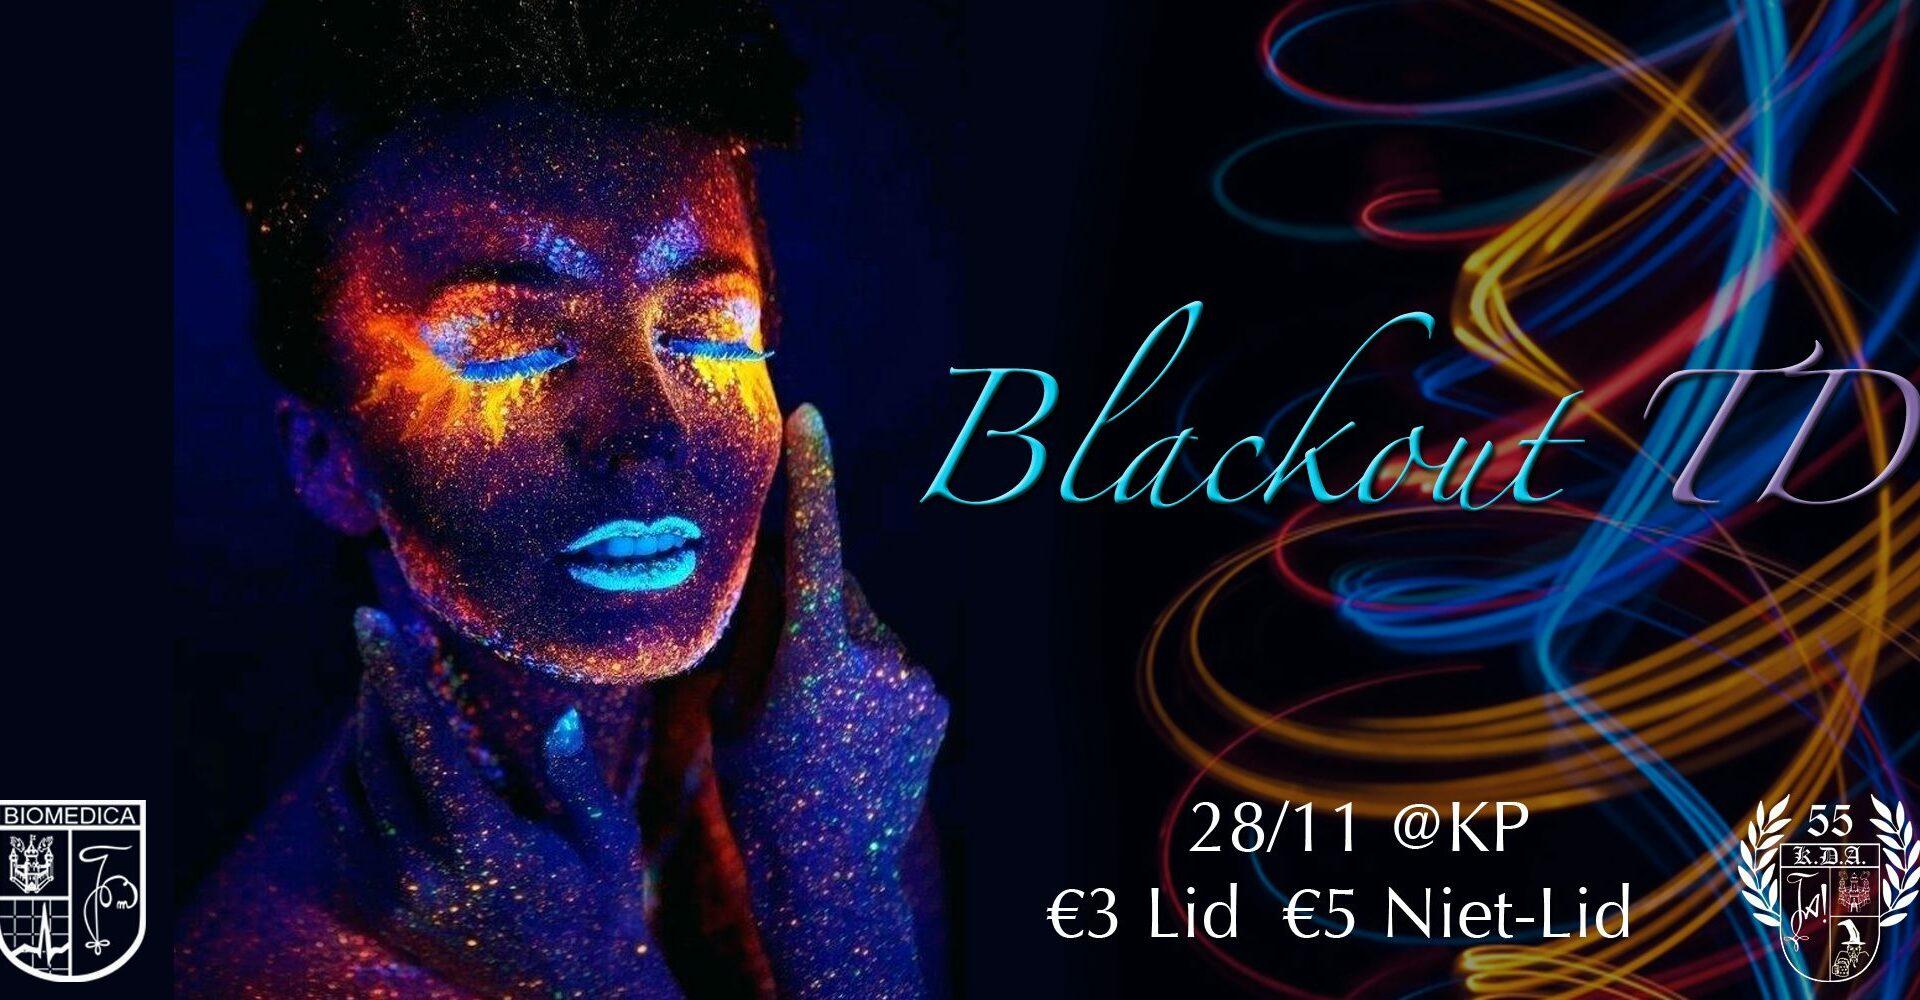 BlackOutTD